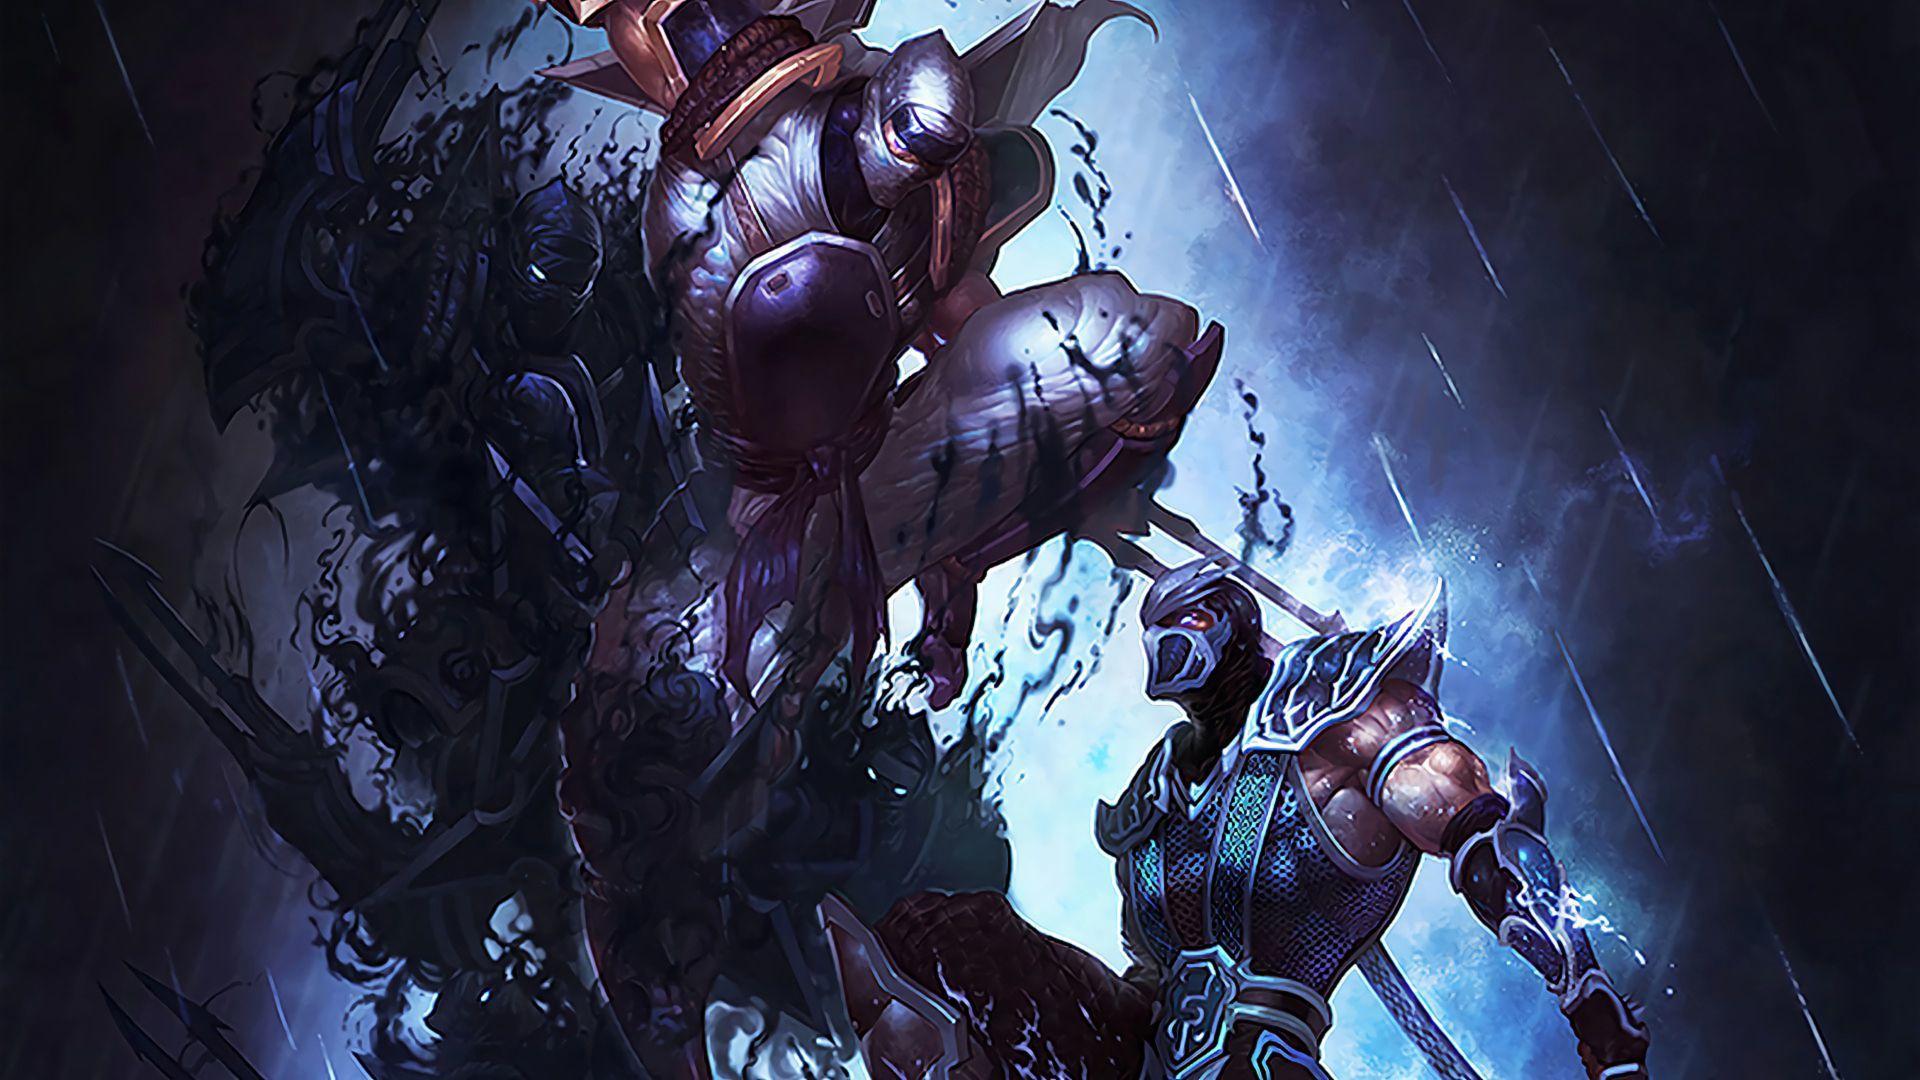 League Of Legends Wallpapers Hd Zed Wallpaper Cave